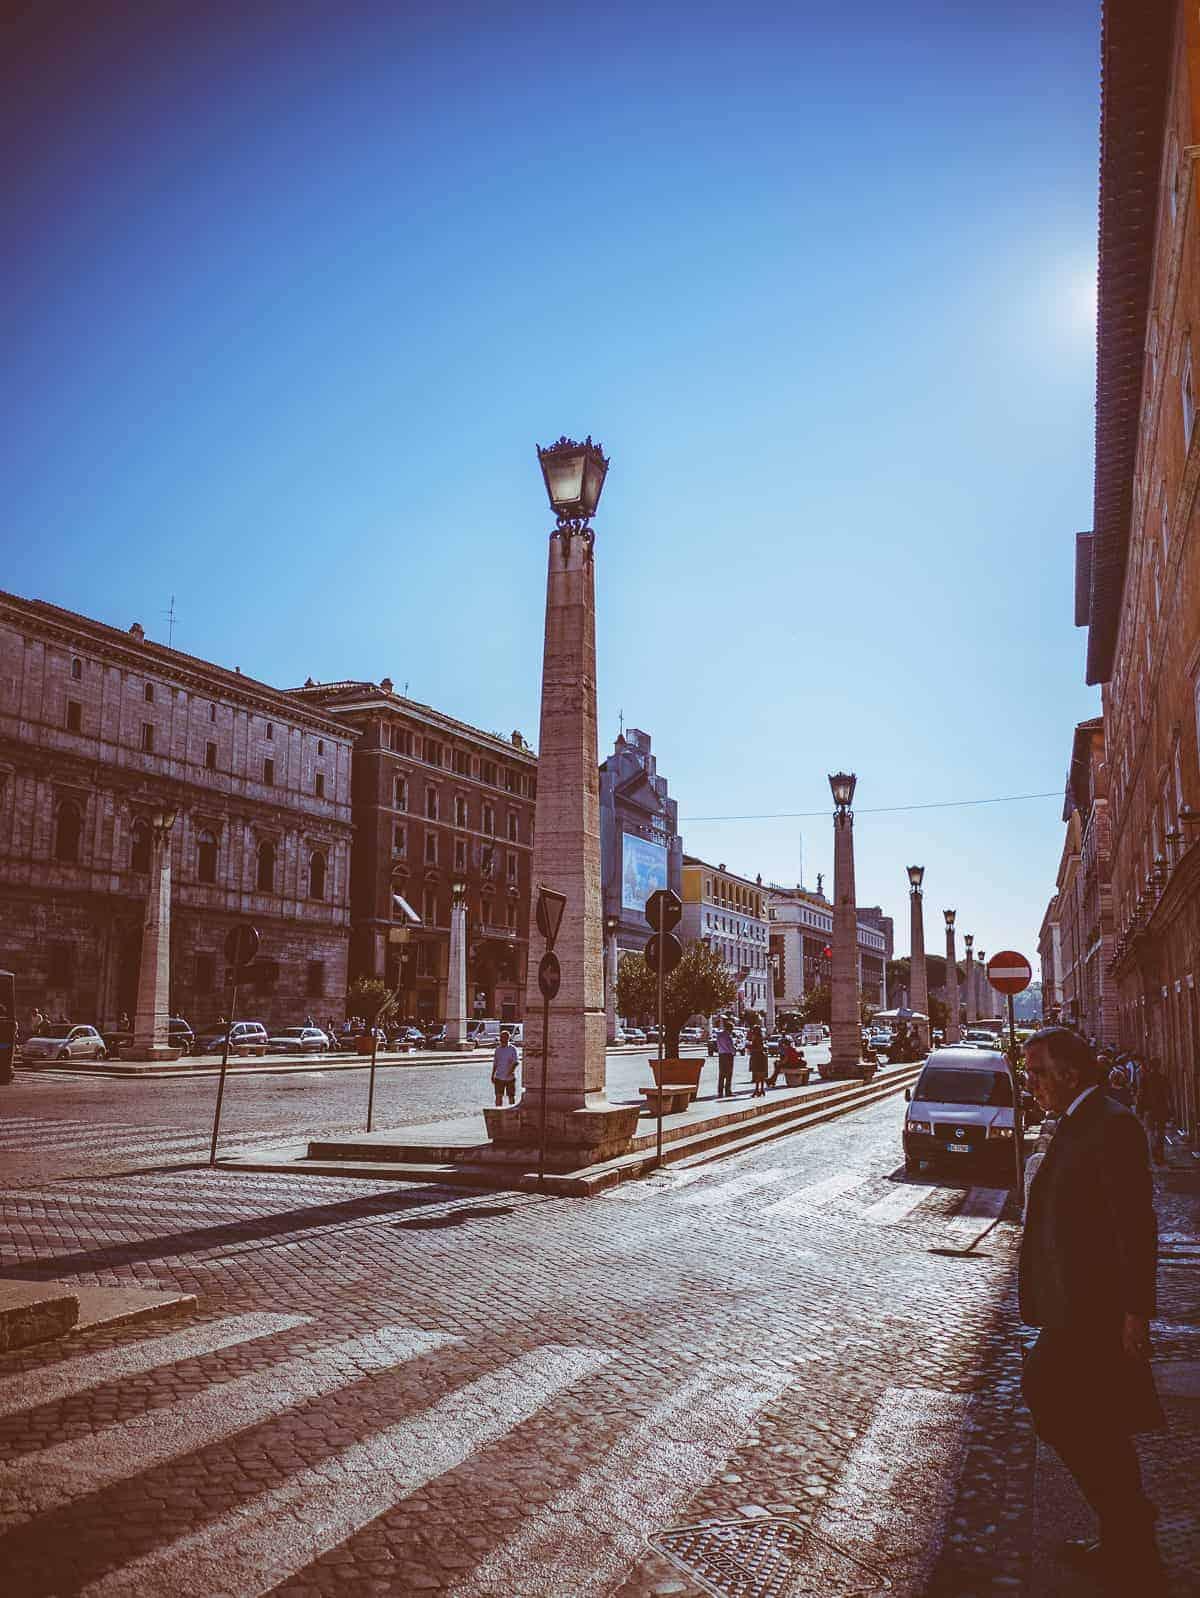 St Peter's Vatican - ex[ploring Rome